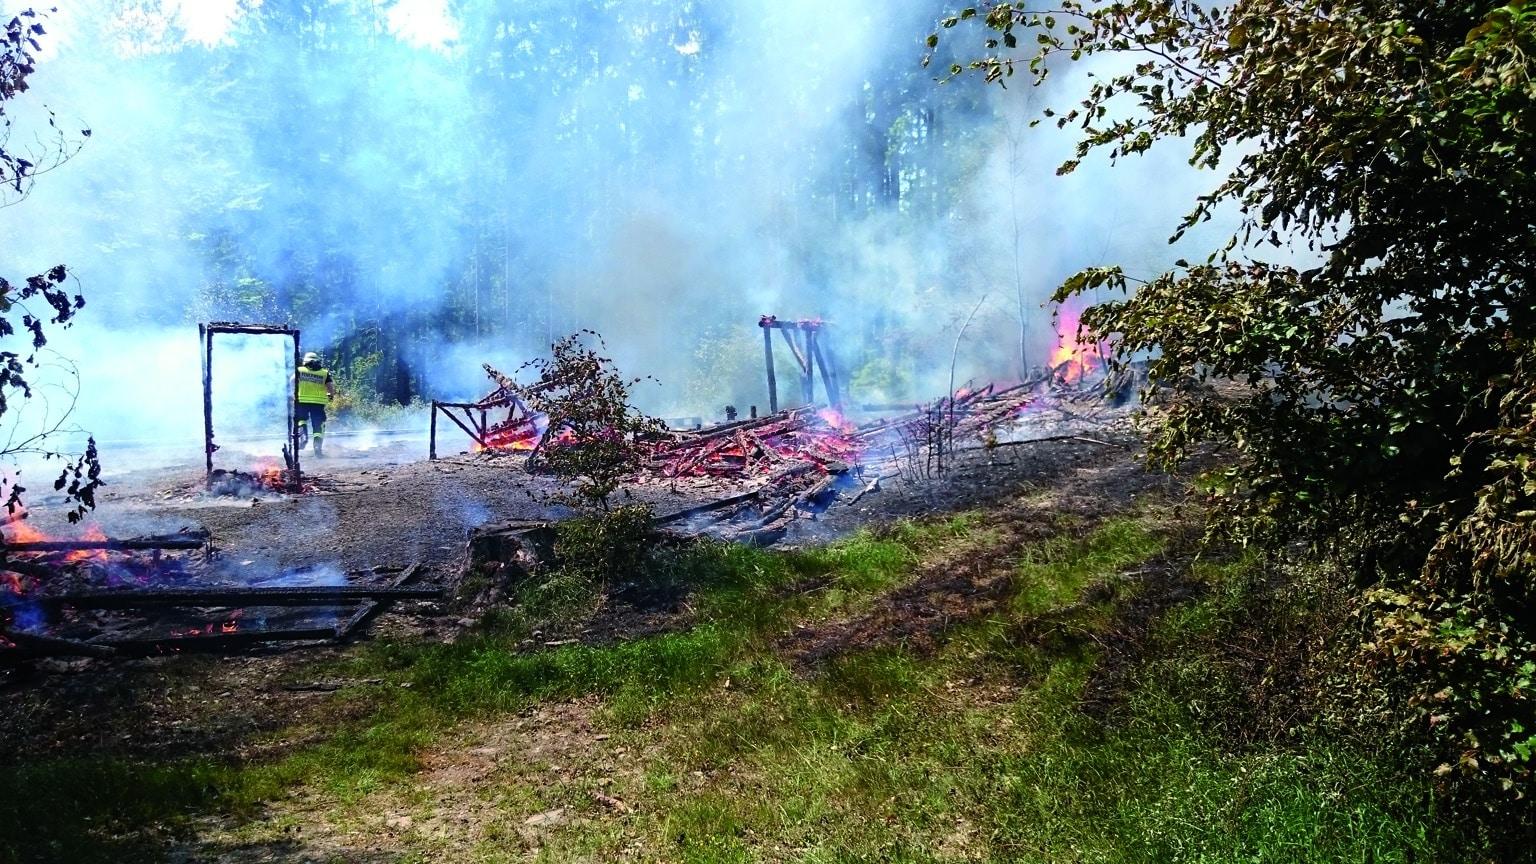 Photo of Brand am Wald-Showset im FORT FUN Abenteuerland